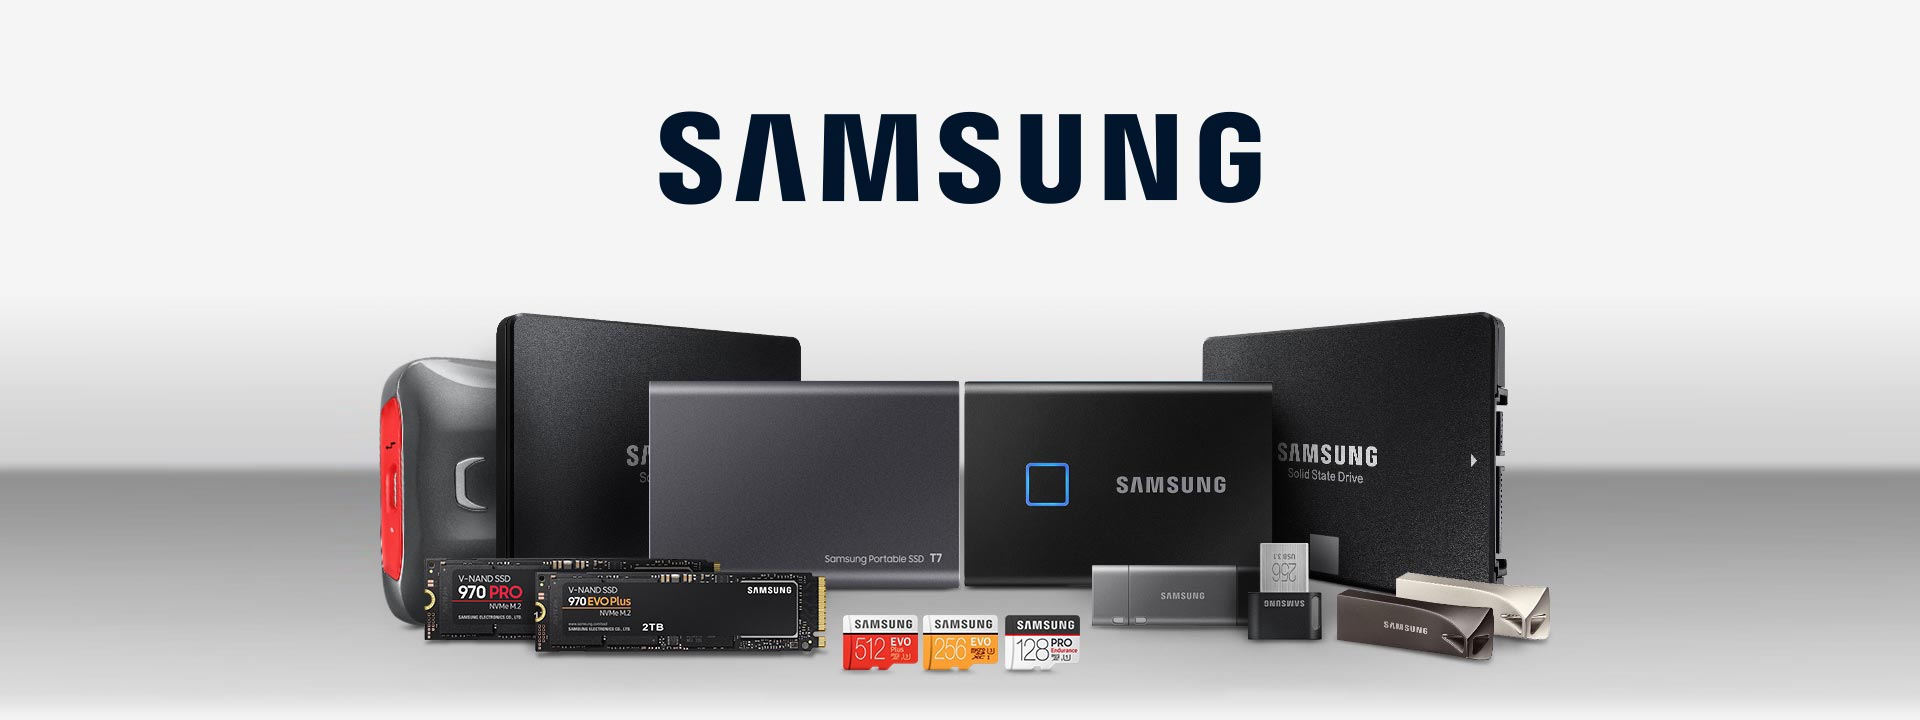 سامسونگ | Samsung